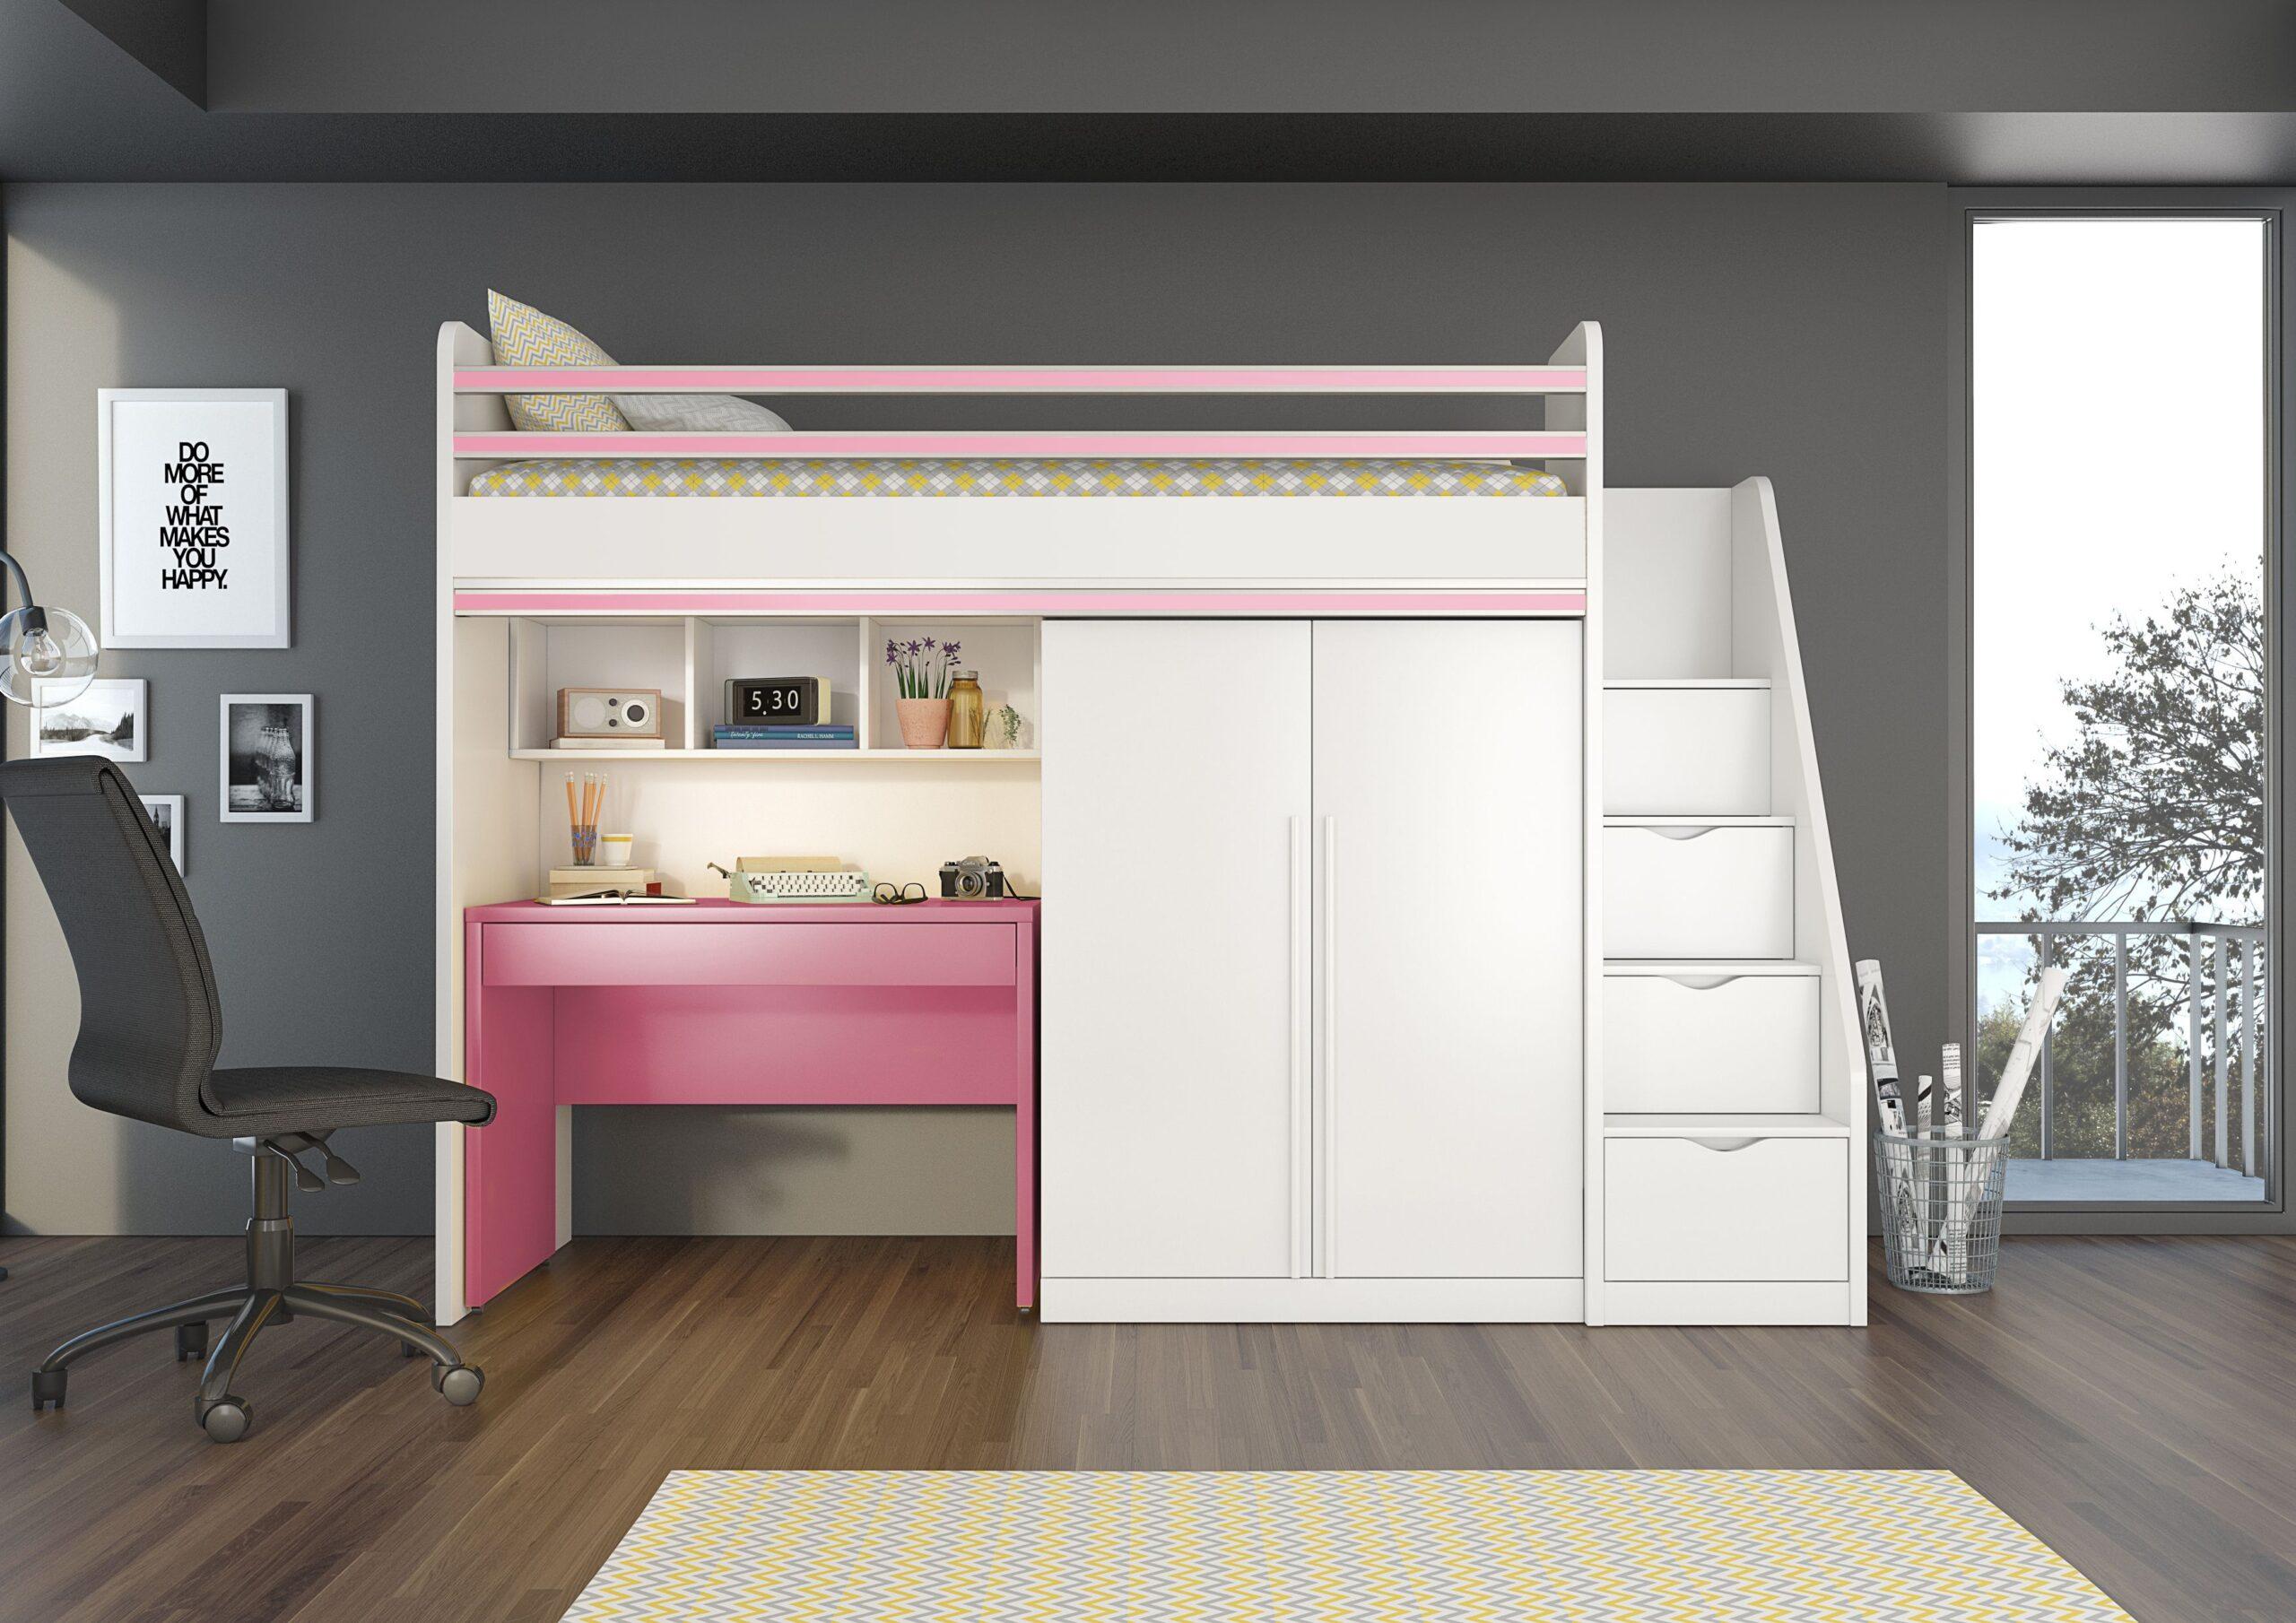 Full Size of Kinderzimmer Hochbett Regal Weiß Regale Sofa Kinderzimmer Kinderzimmer Hochbett